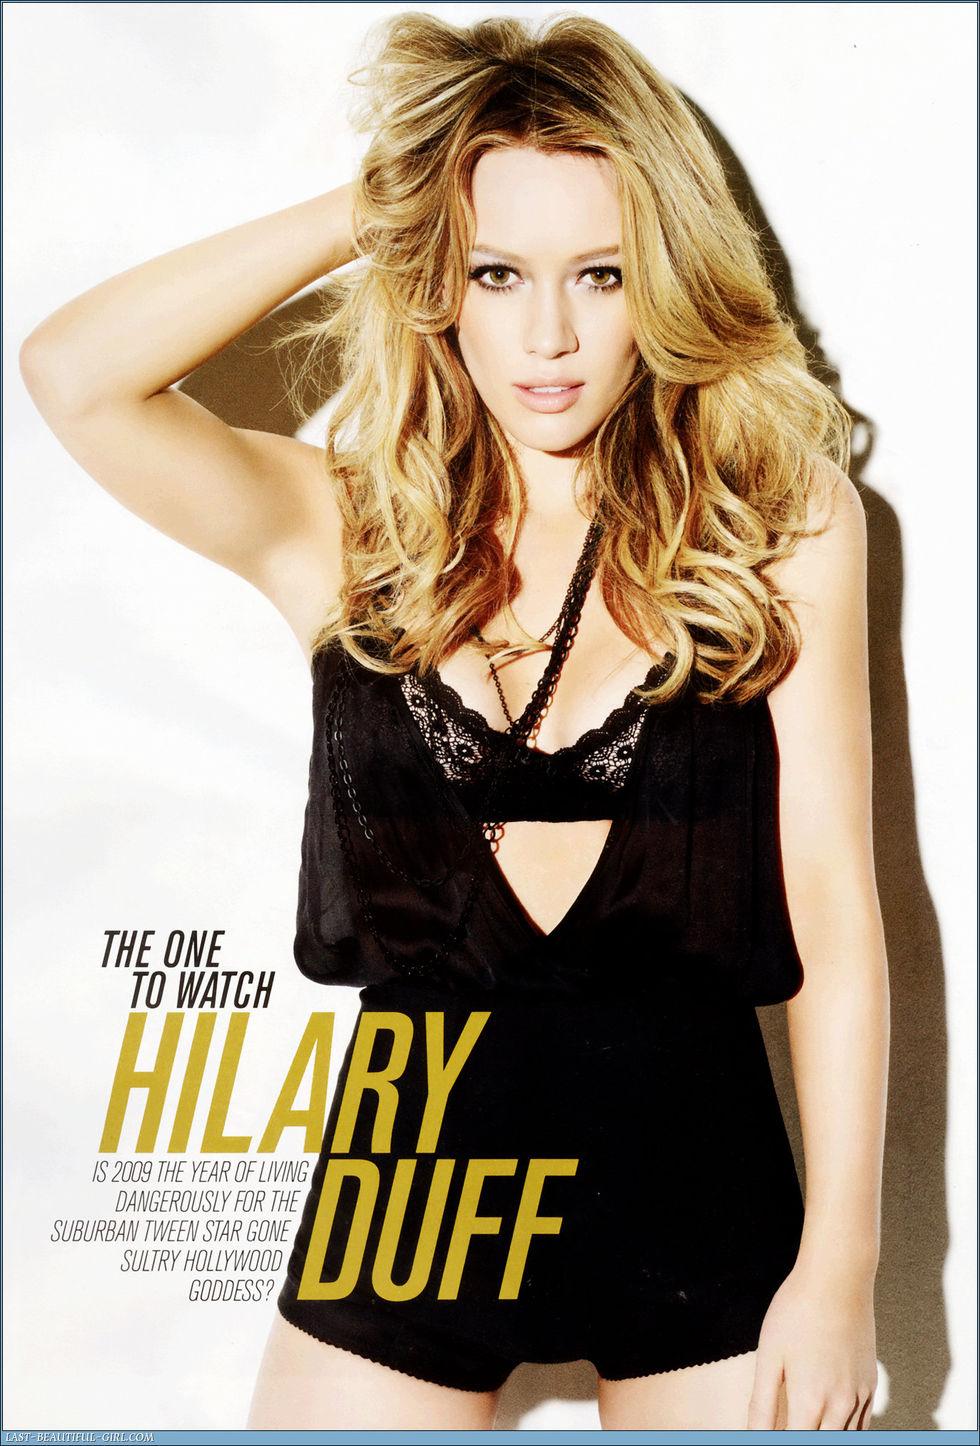 Hilary duff maxim magazine jan 2009 hq scans nude (45 photos), Tits Celebrity pic